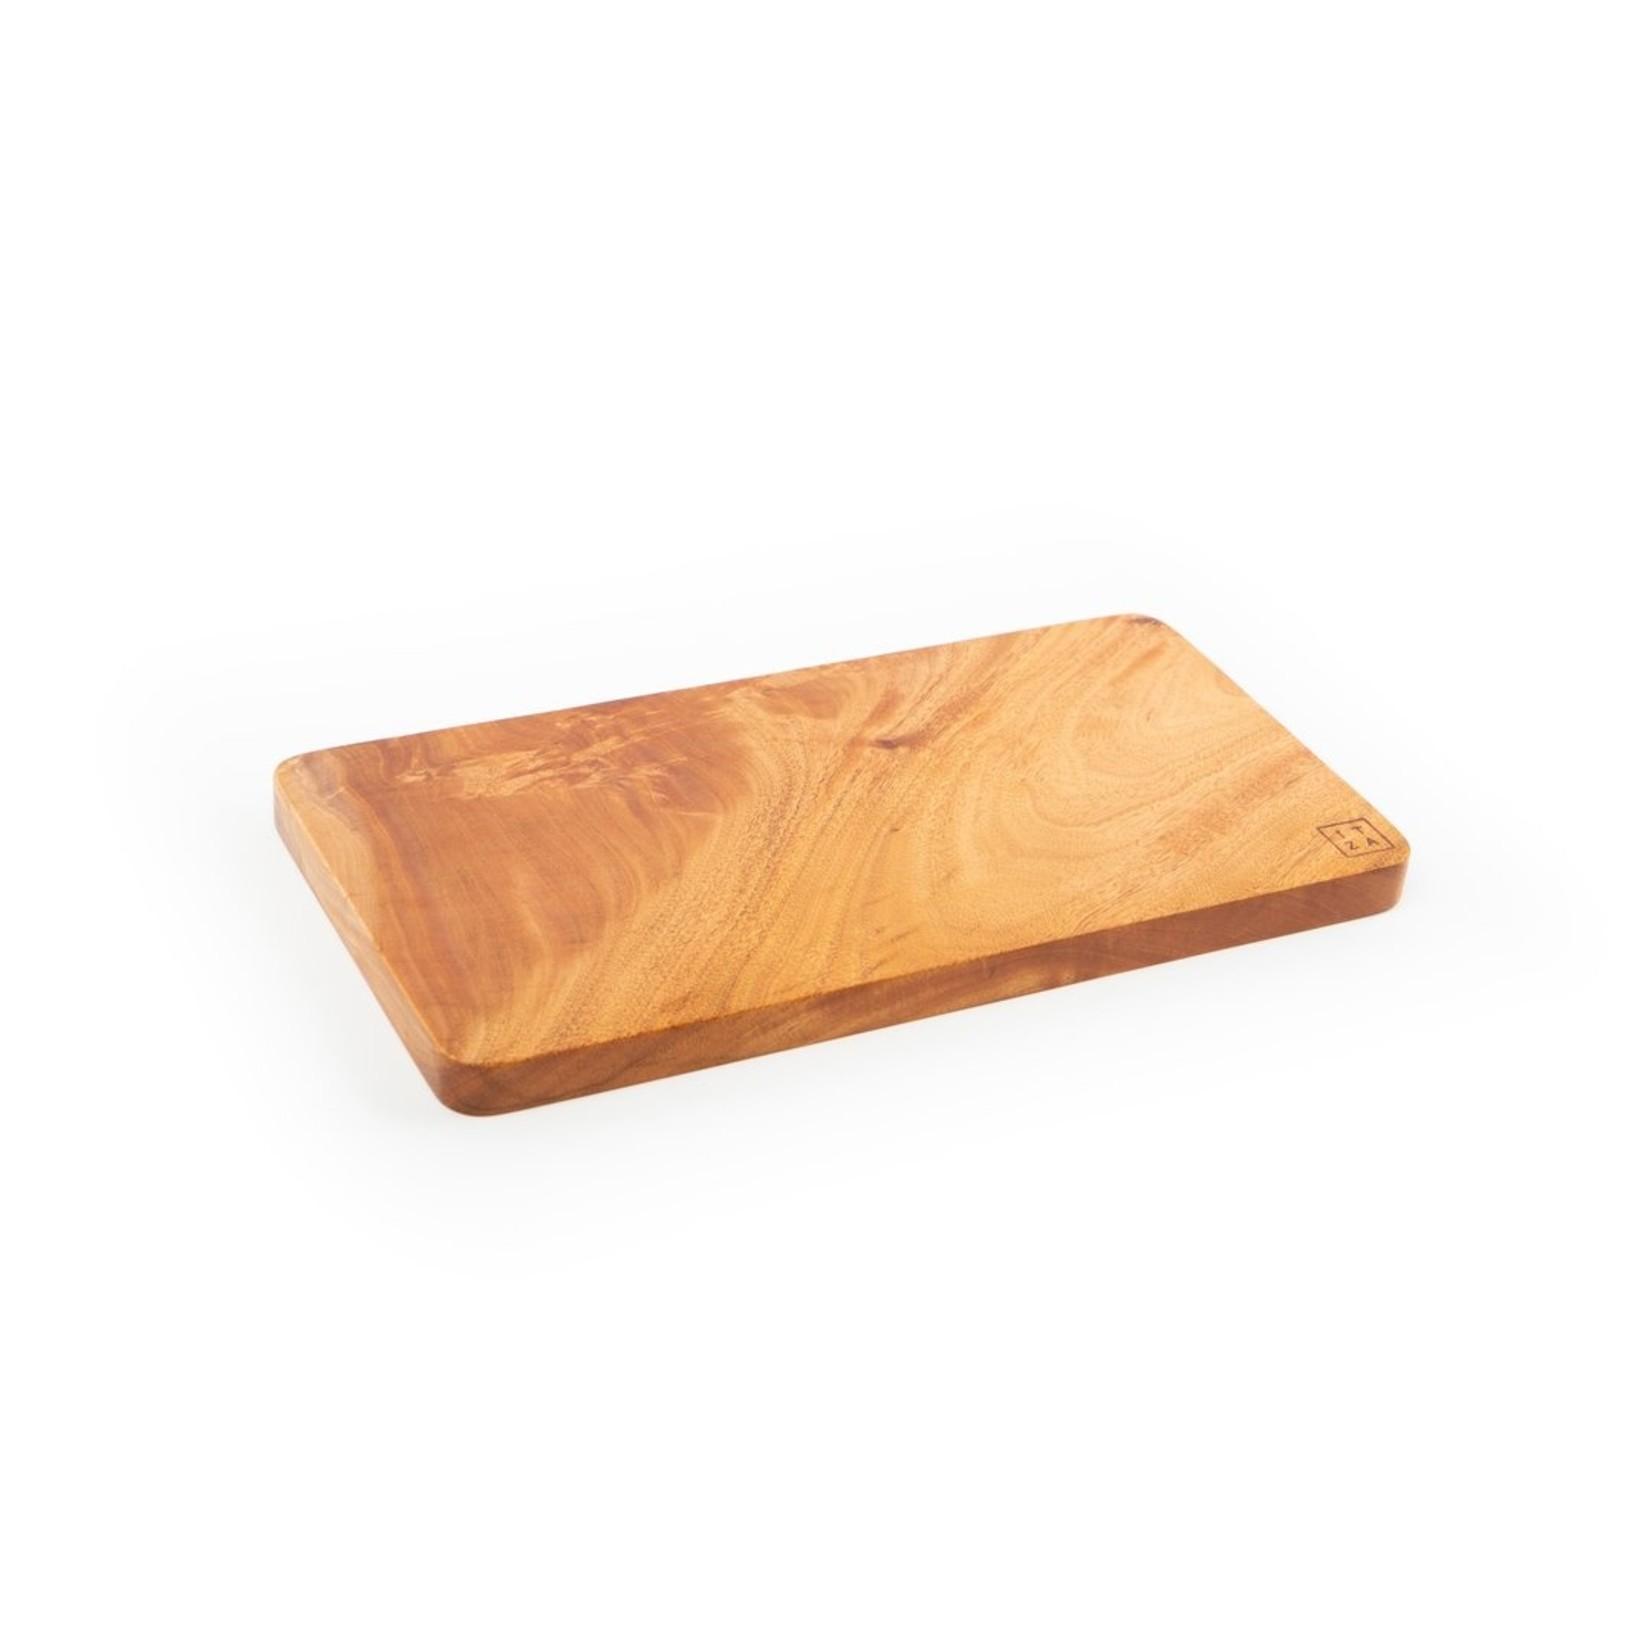 Itza Wood Charcuterie Board